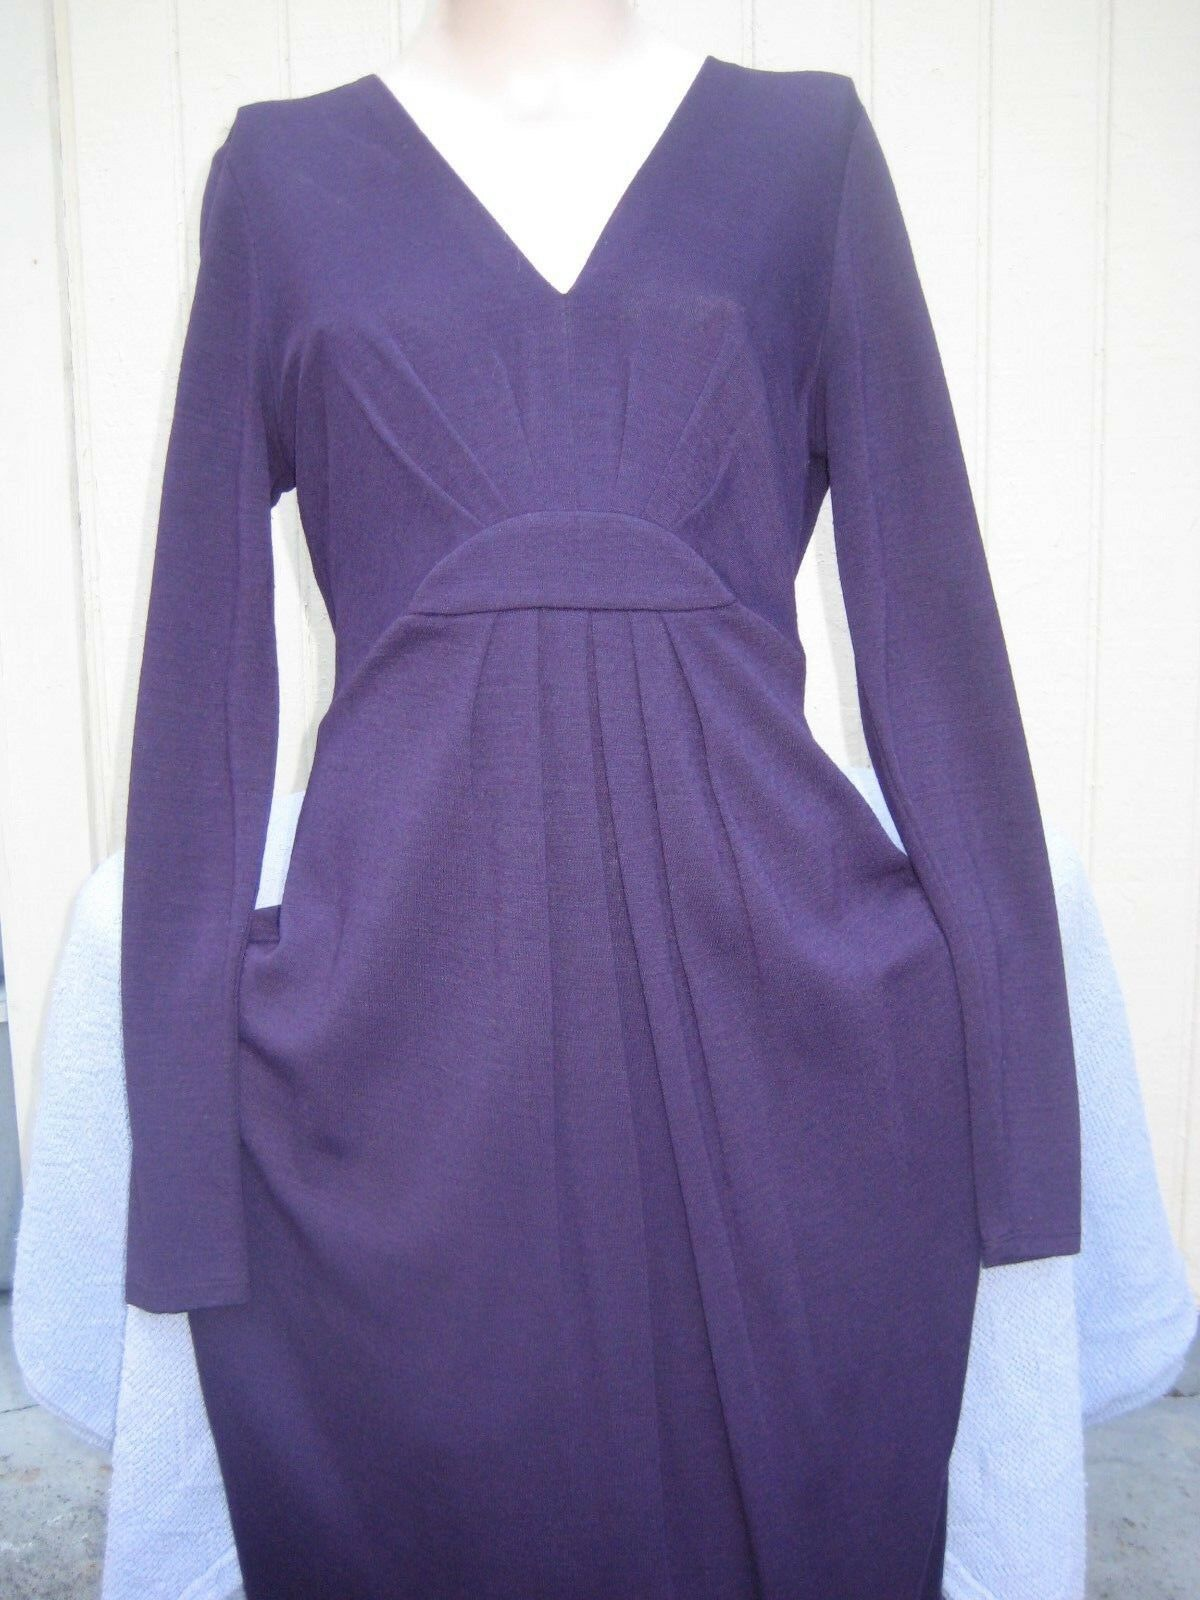 Elie Tahari Dress Größe Small